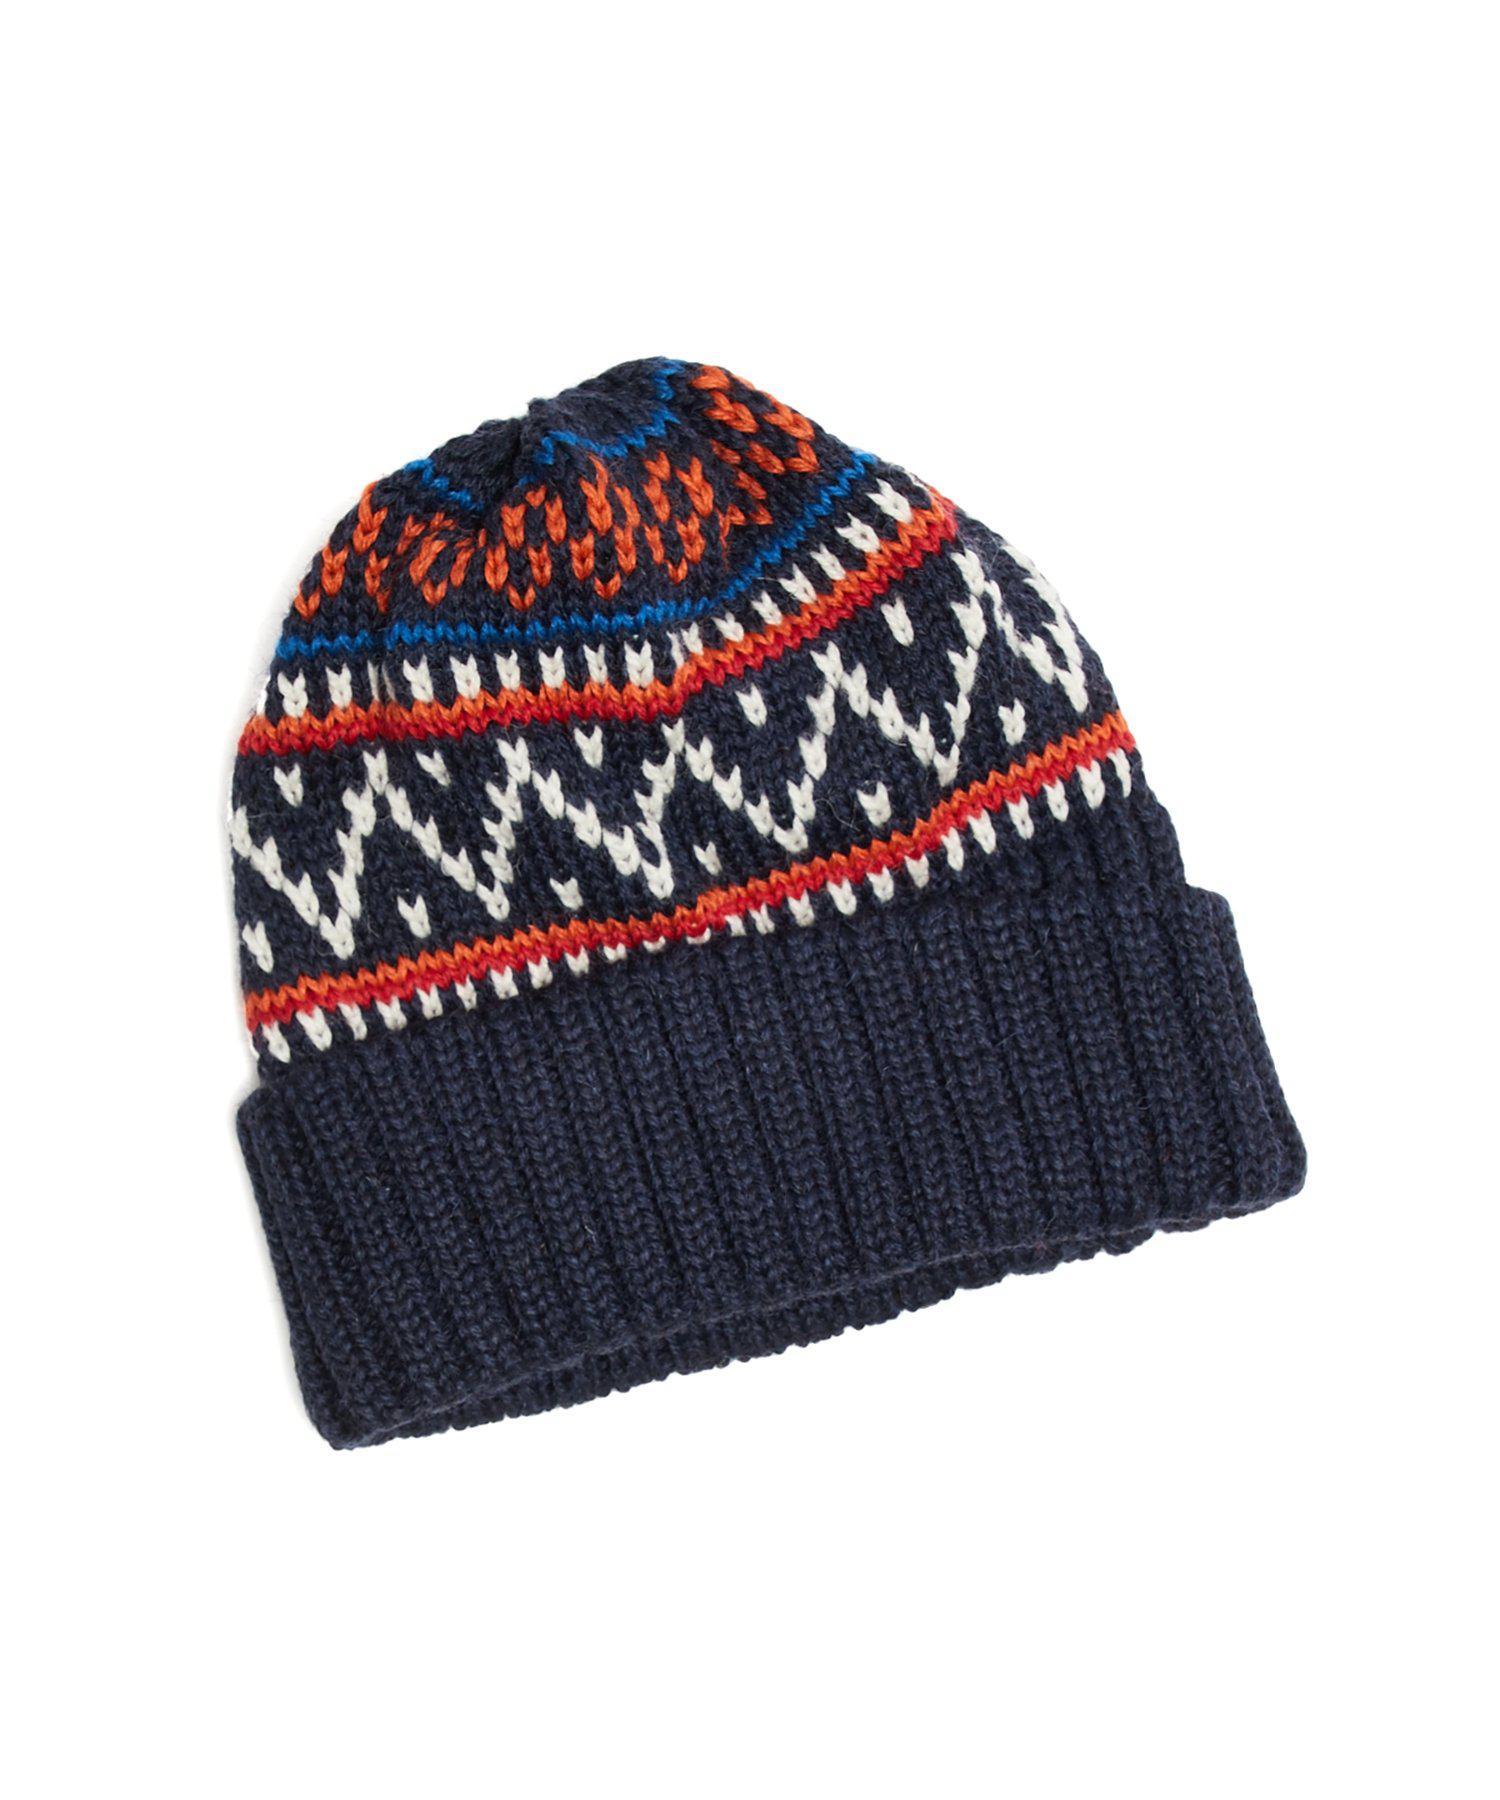 c83c0031620 Drake S Drakes  Navy Nordic Wool Hat in Blue for Men - Lyst